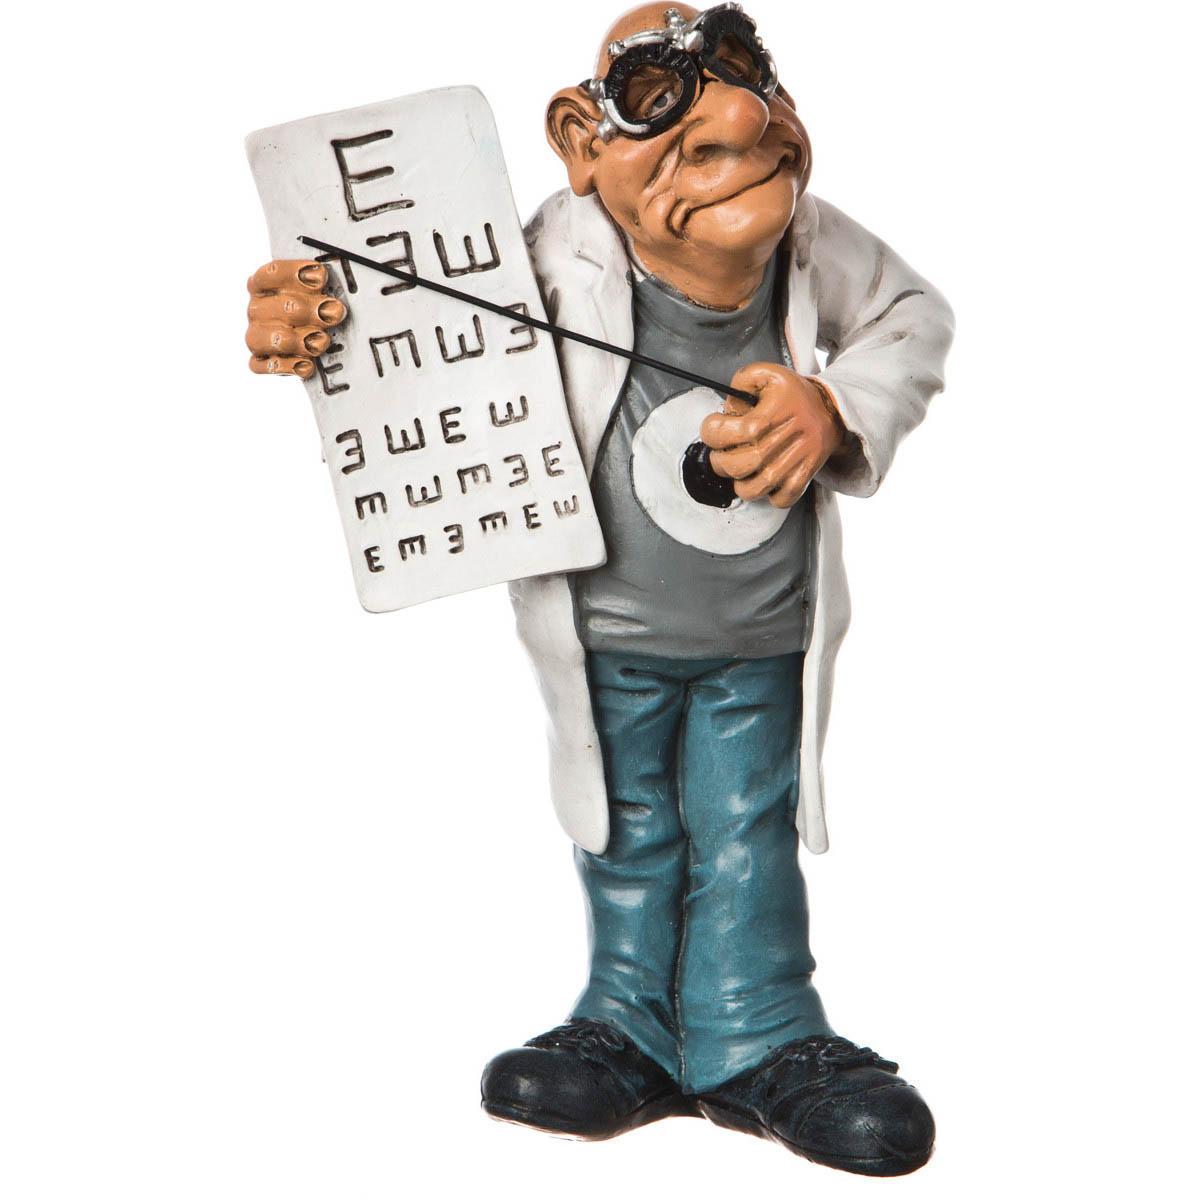 {} The Comical World Фигурка Окулист (15 см) фигурки the comical world of stratford фигурка петух желаю роскошной жизни